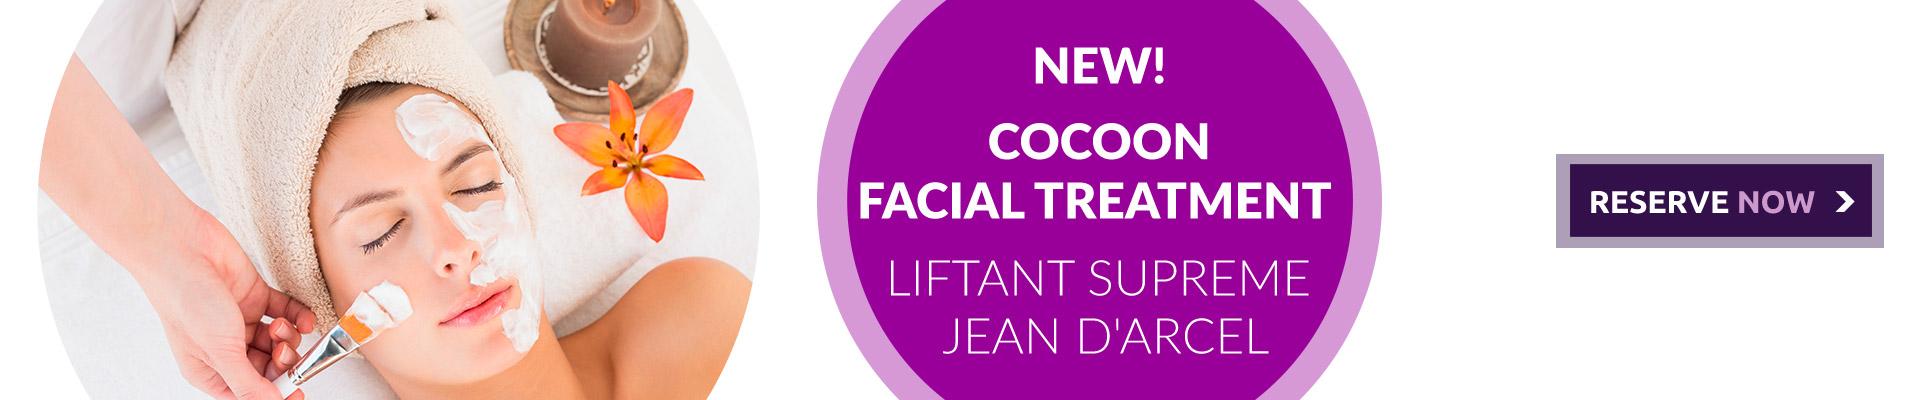 COCOON FACIAL TREATMENT Liftant supreme – Jean D'Arcel